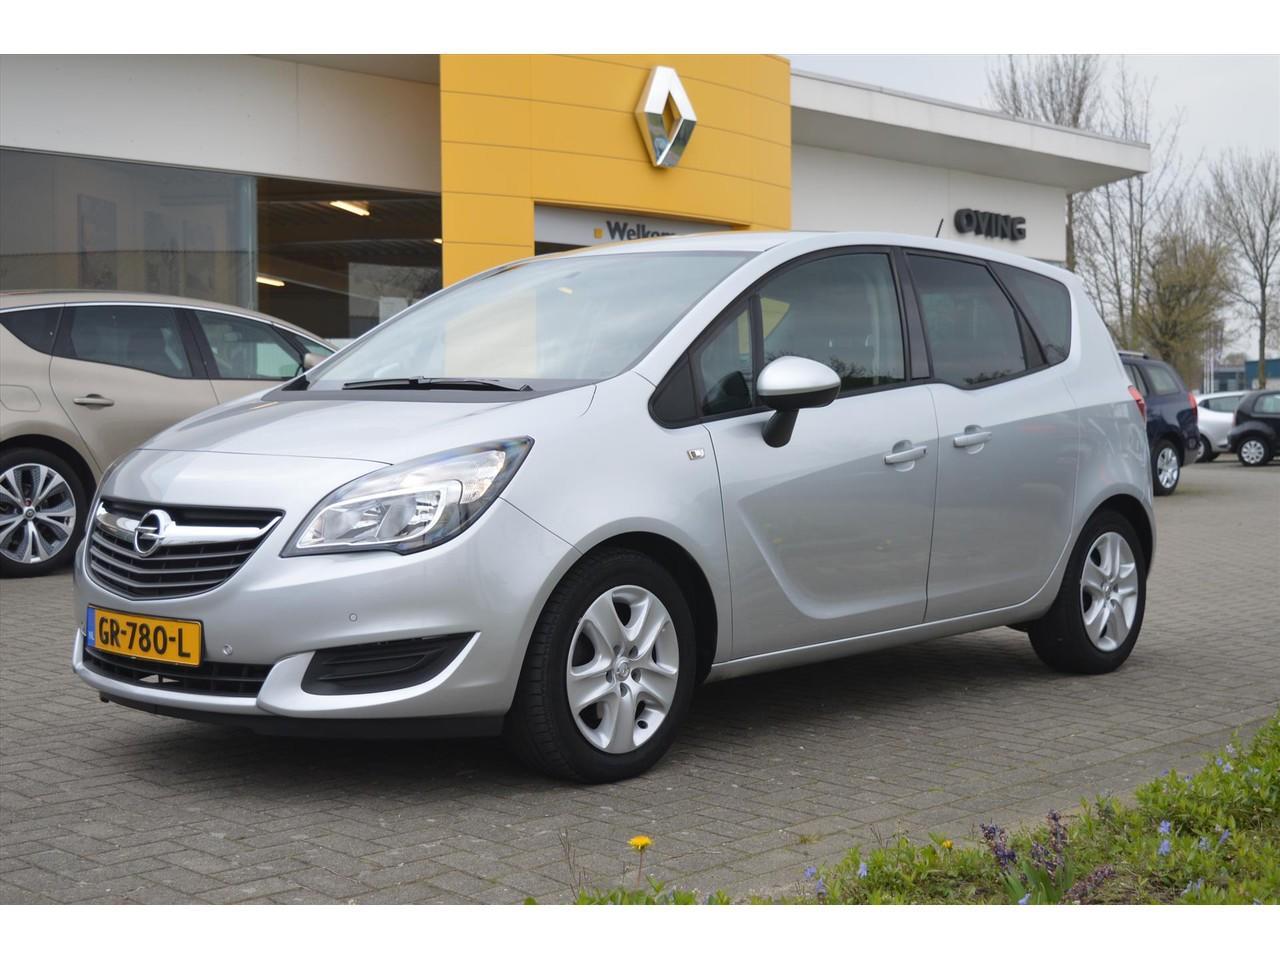 Opel Meriva 1.4 turbo start/stop ecoflex 120pk business+